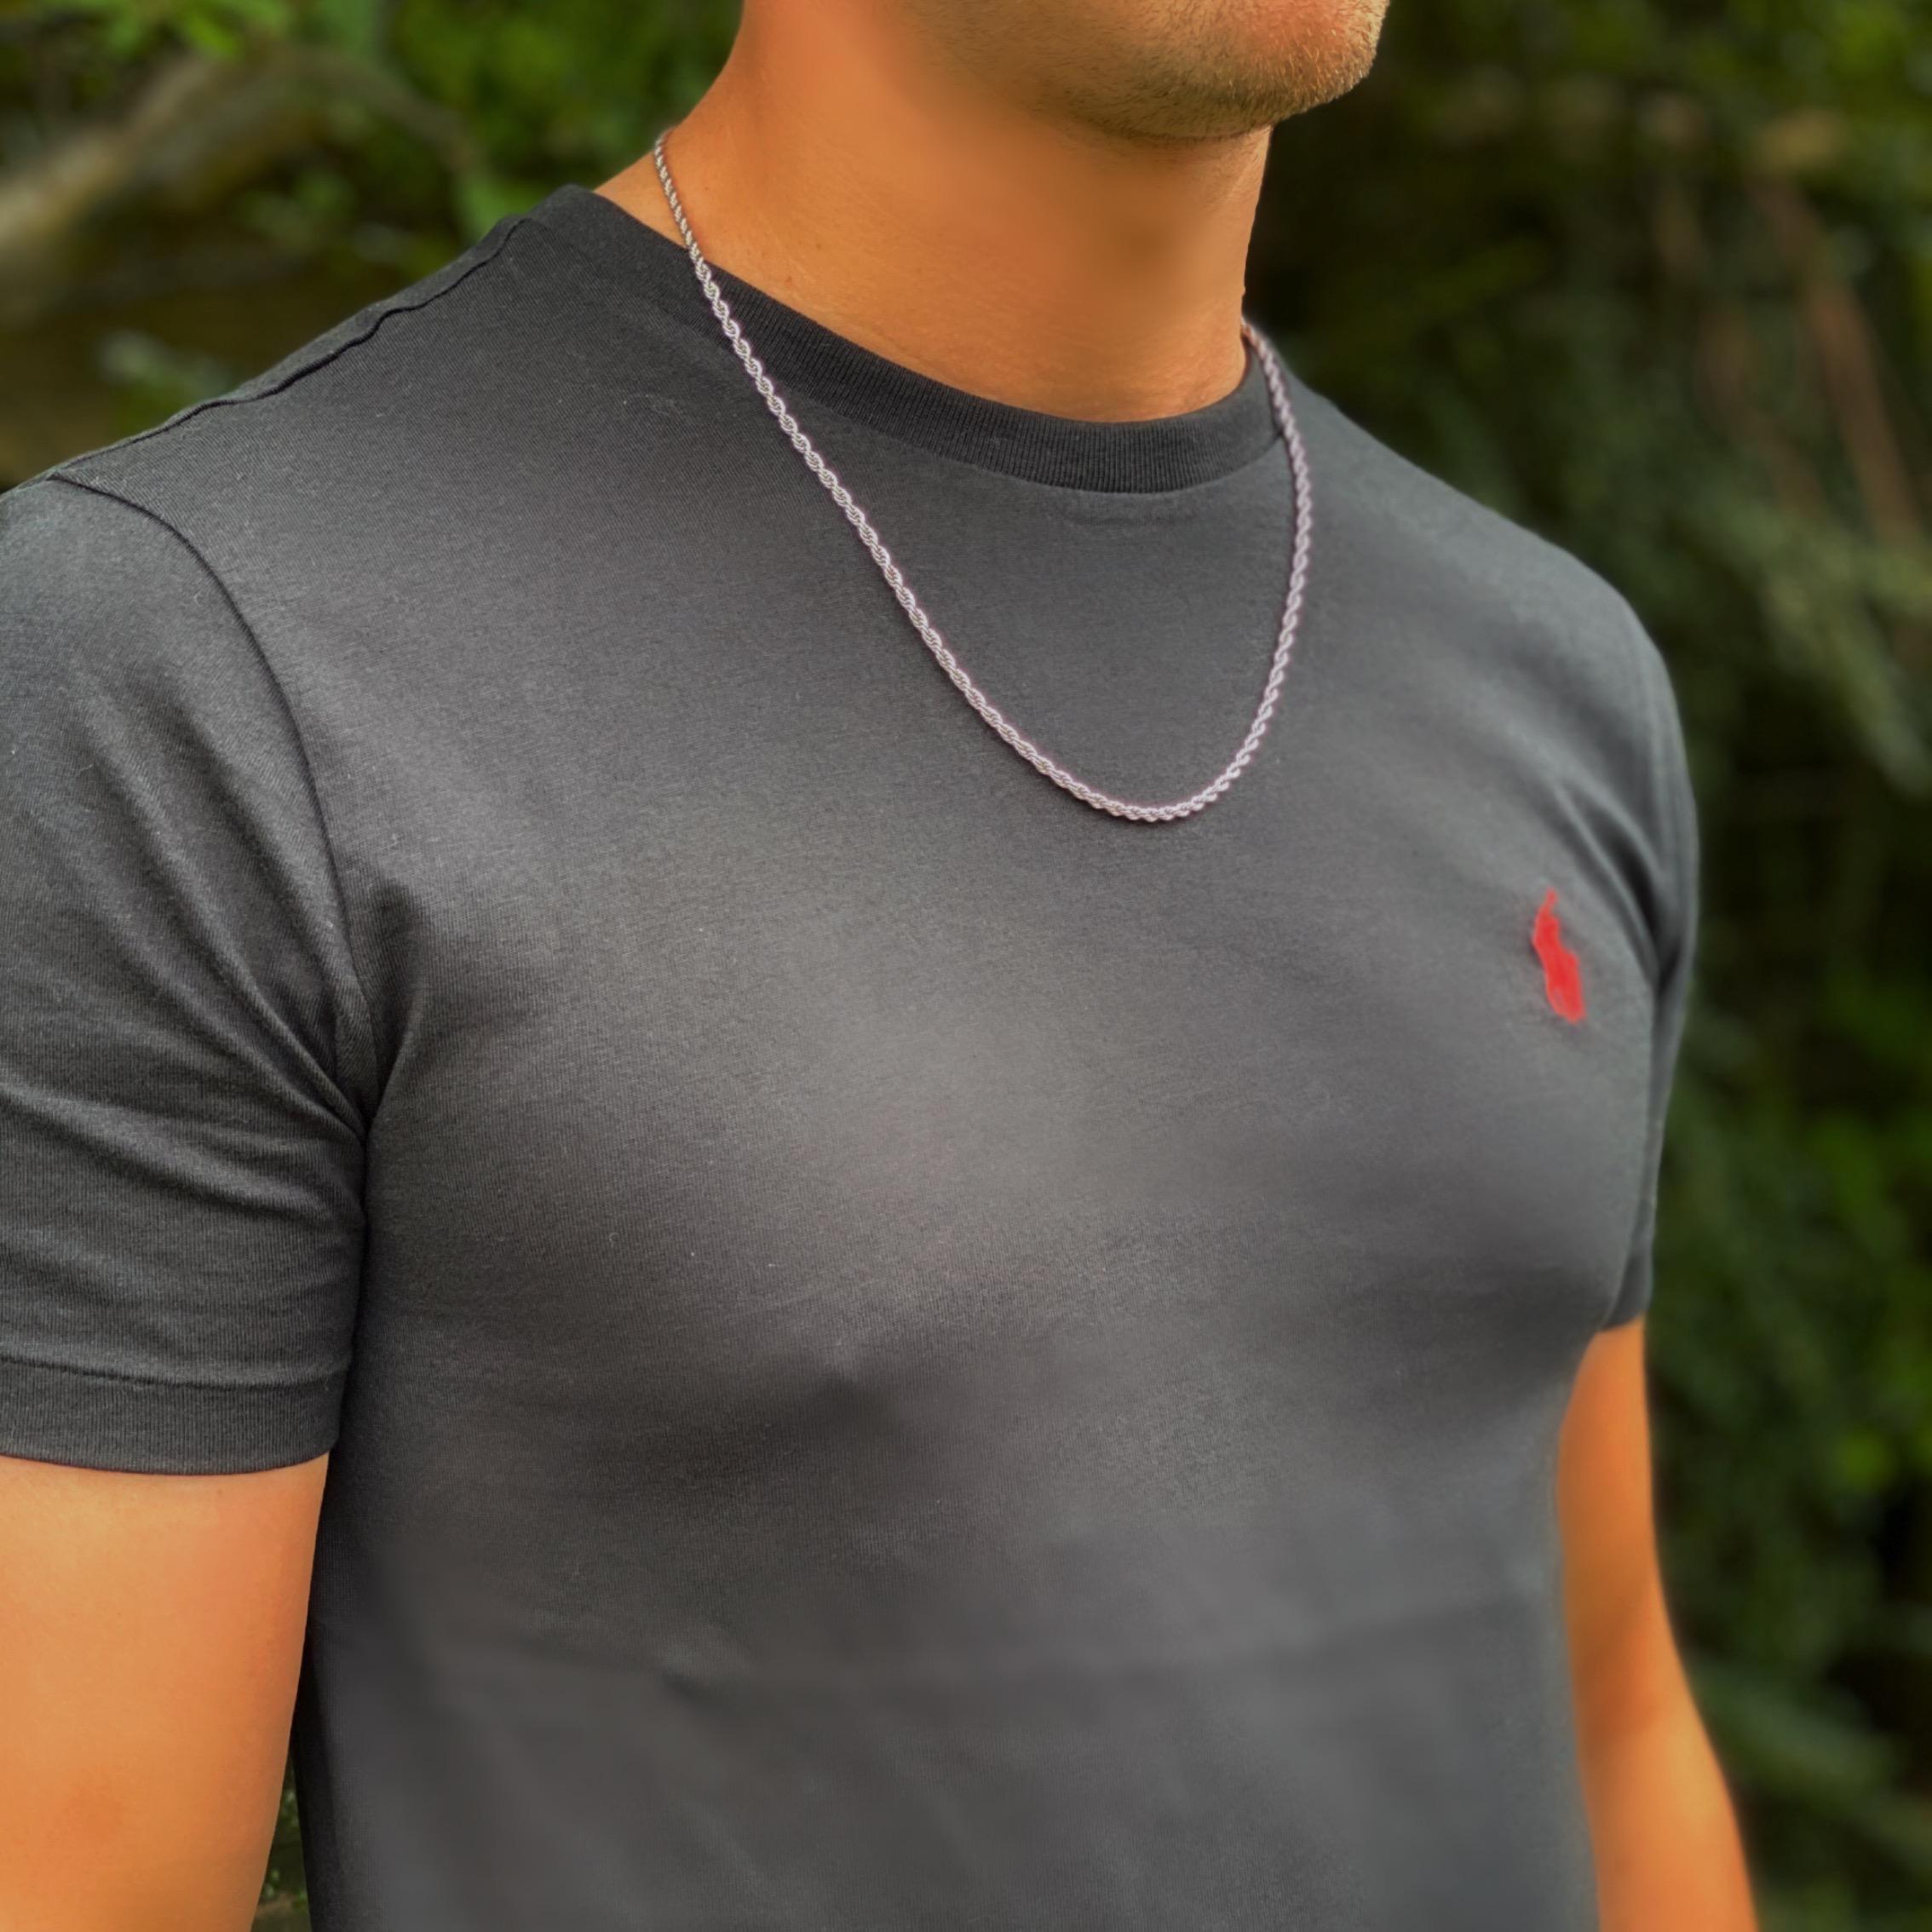 Men's Rope Twist Necklace